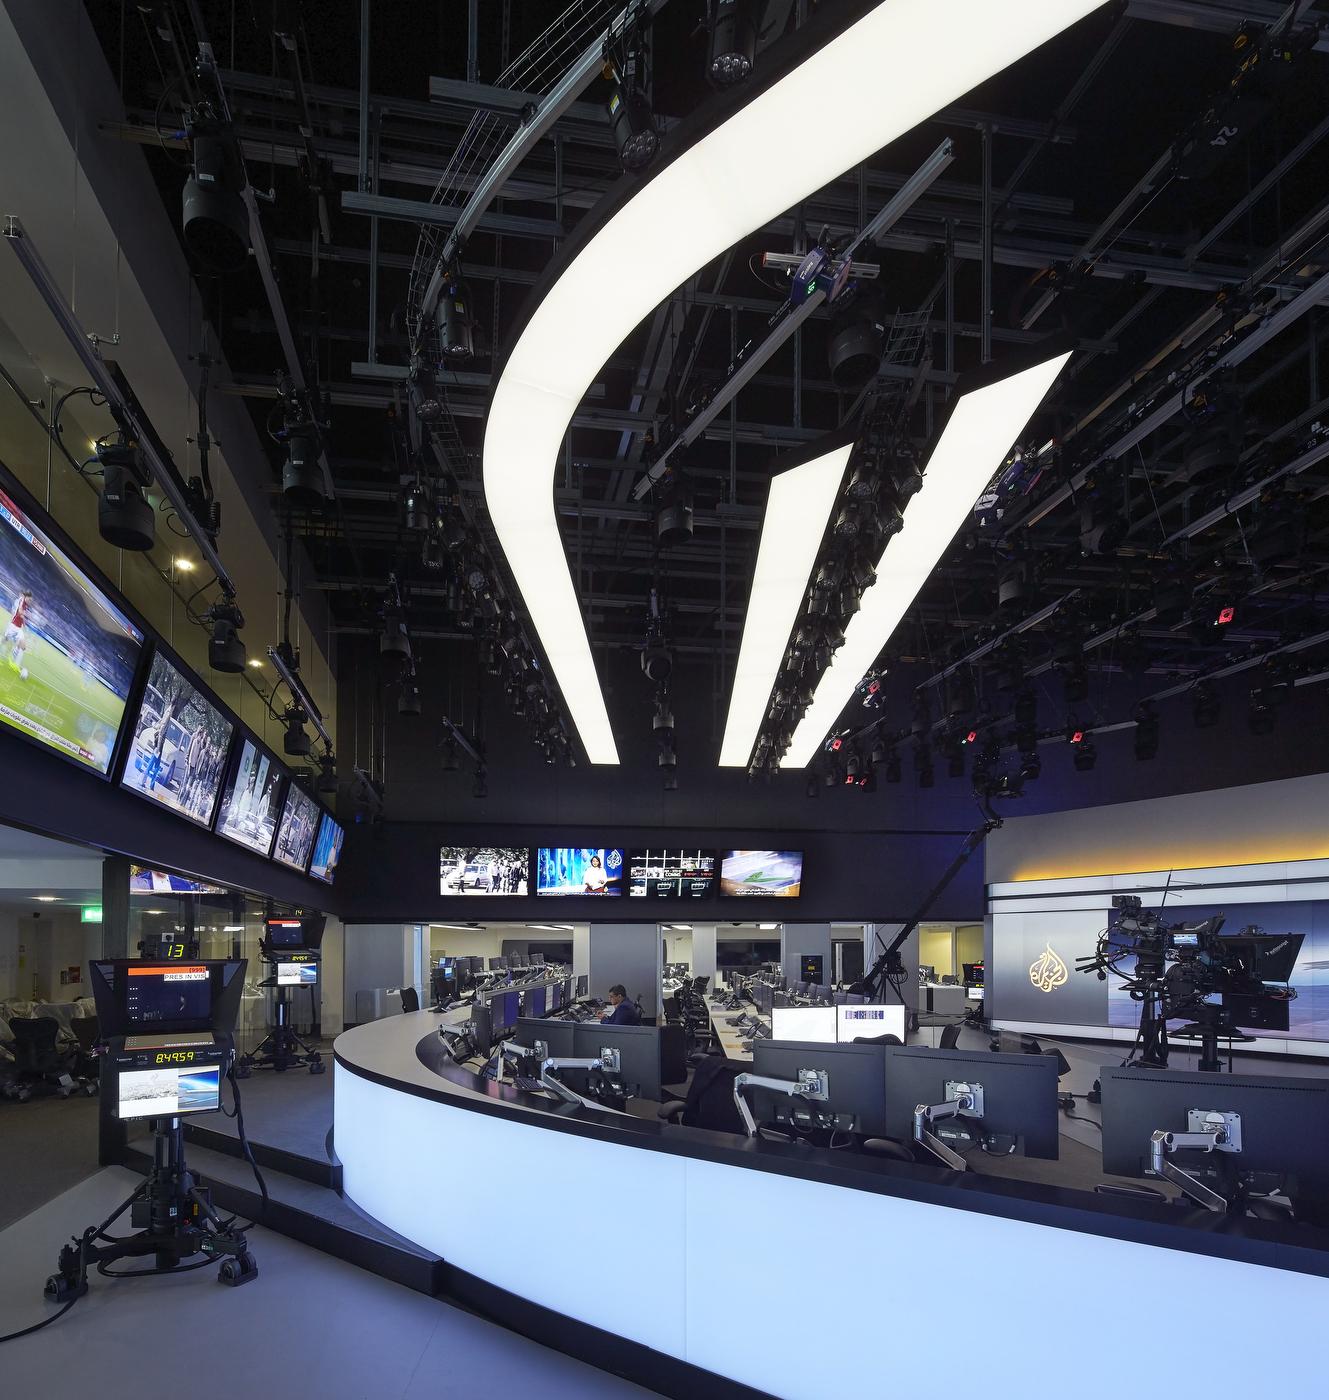 NCS_Al-Jazeera-Newsroom-Studio-5_0001